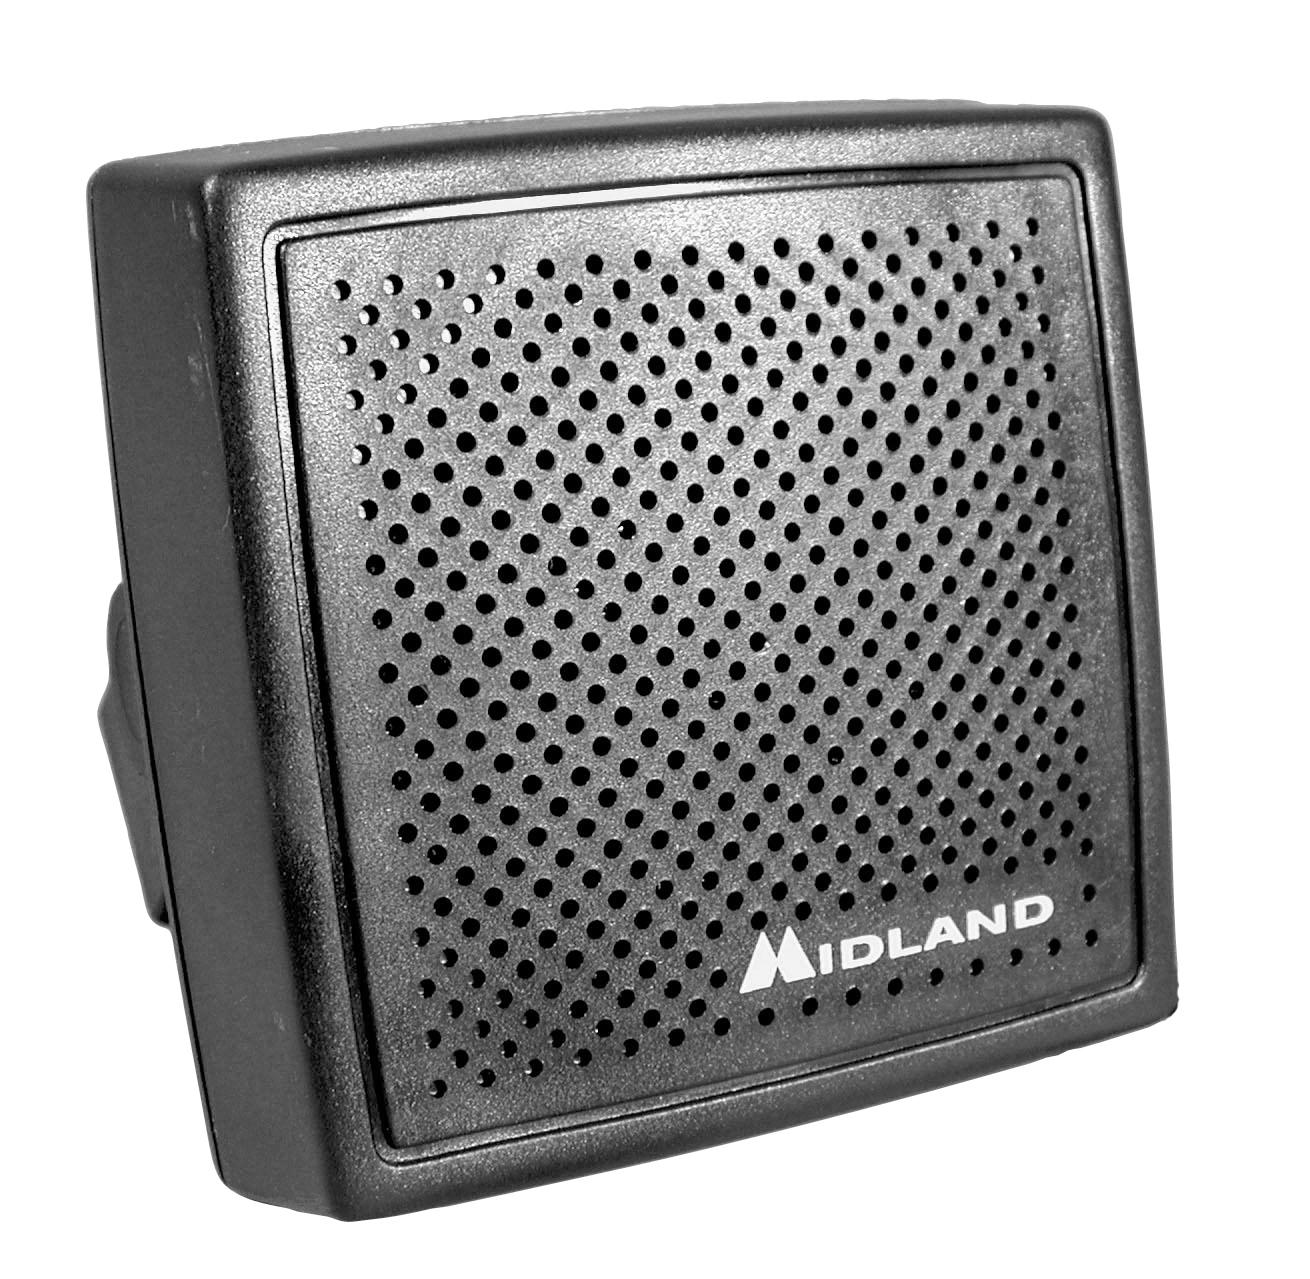 21406 - Midland Deluxe External Speaker